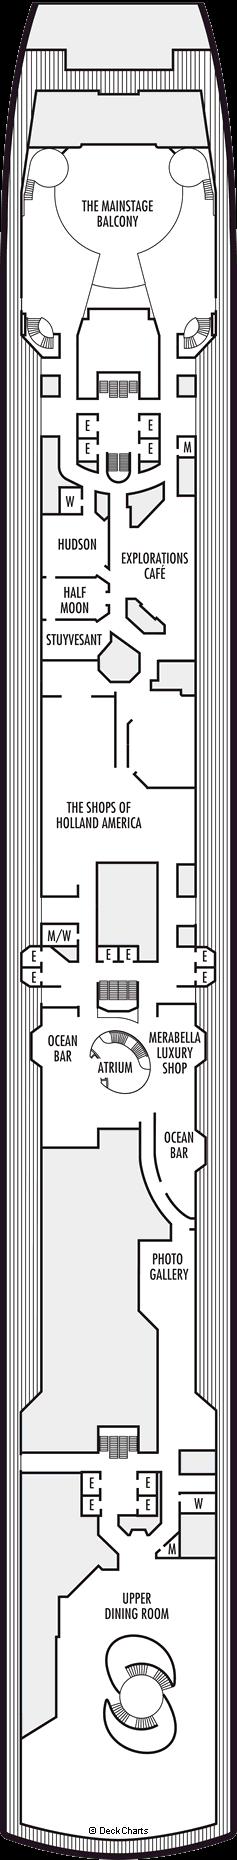 Noordam: Promenade Deck